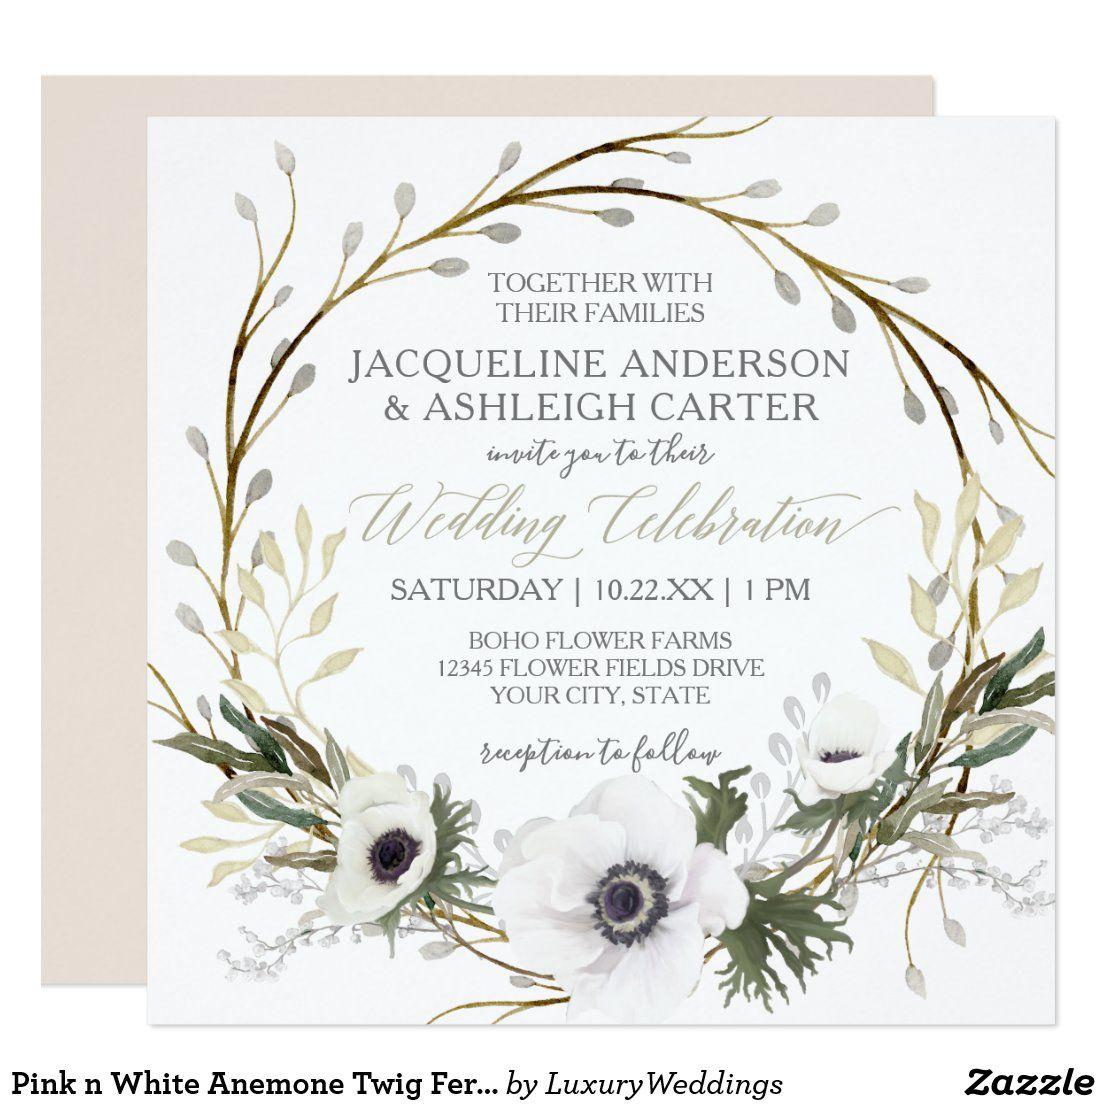 Photo of Pink n White Anemone Branch Twig Eucalyptus Wreath Invitation   Zazzle.com